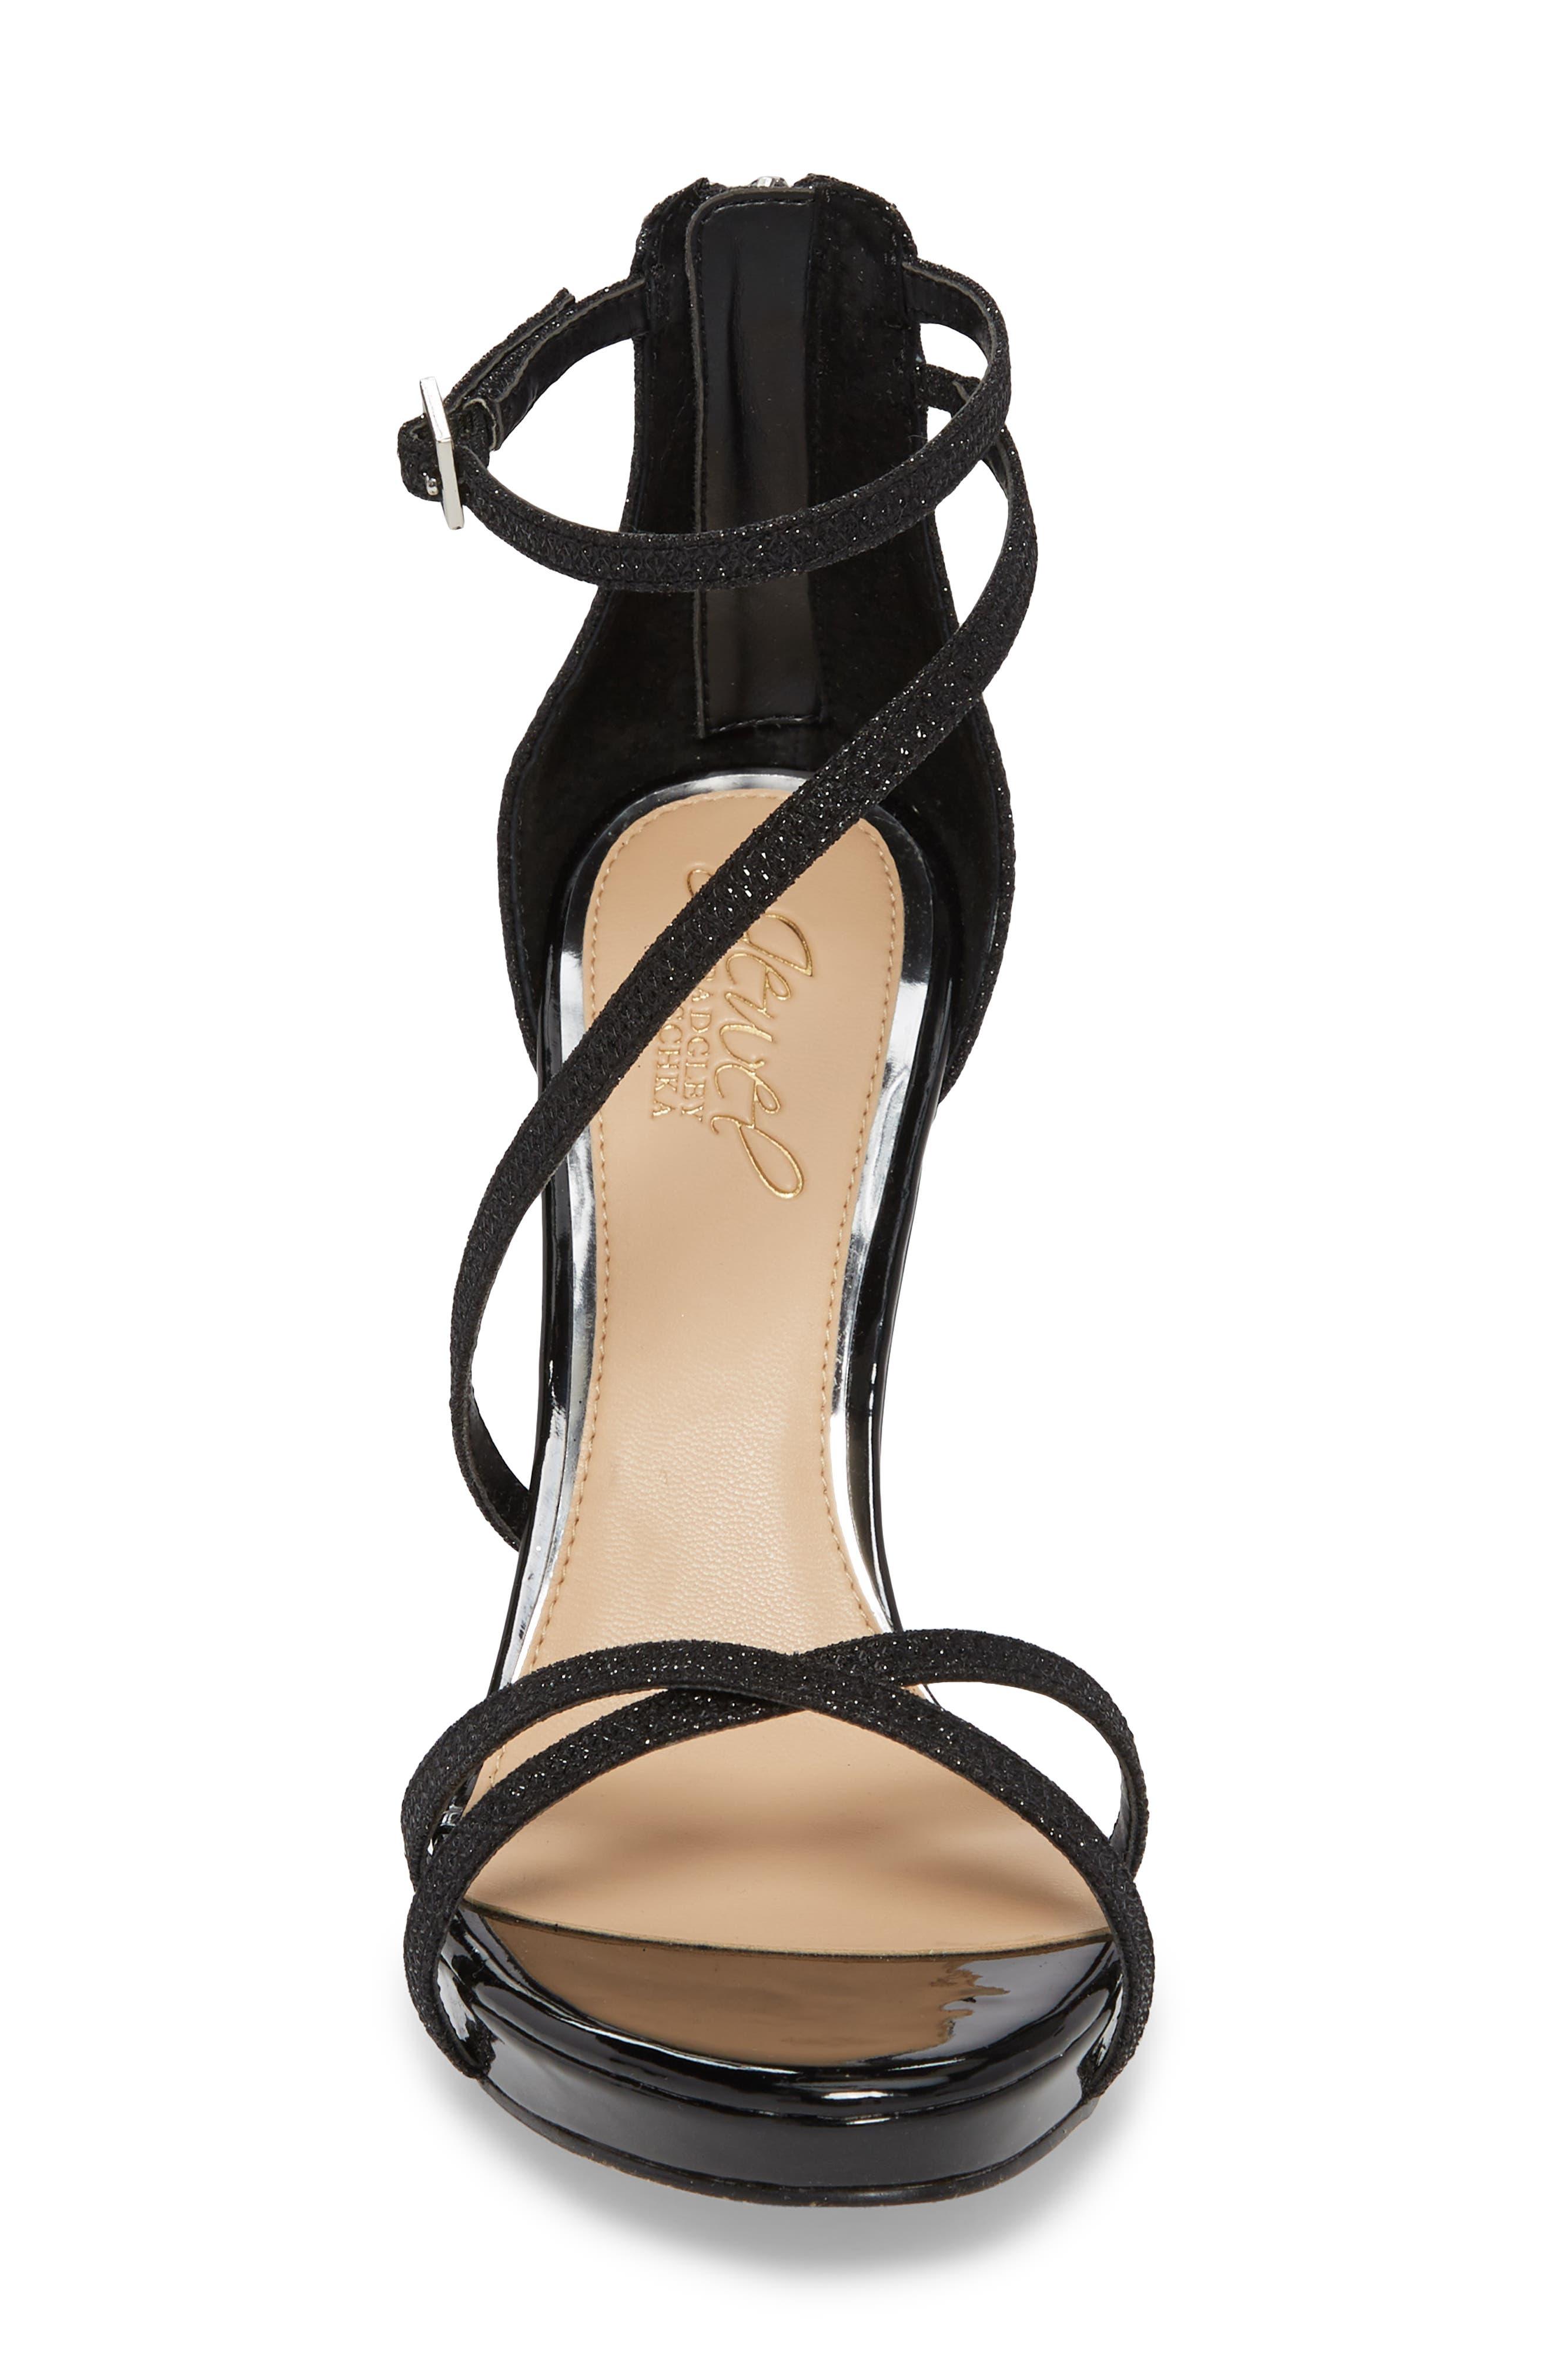 Galen Strappy Platform Sandal,                             Alternate thumbnail 4, color,                             BLACK GLITTER FABRIC